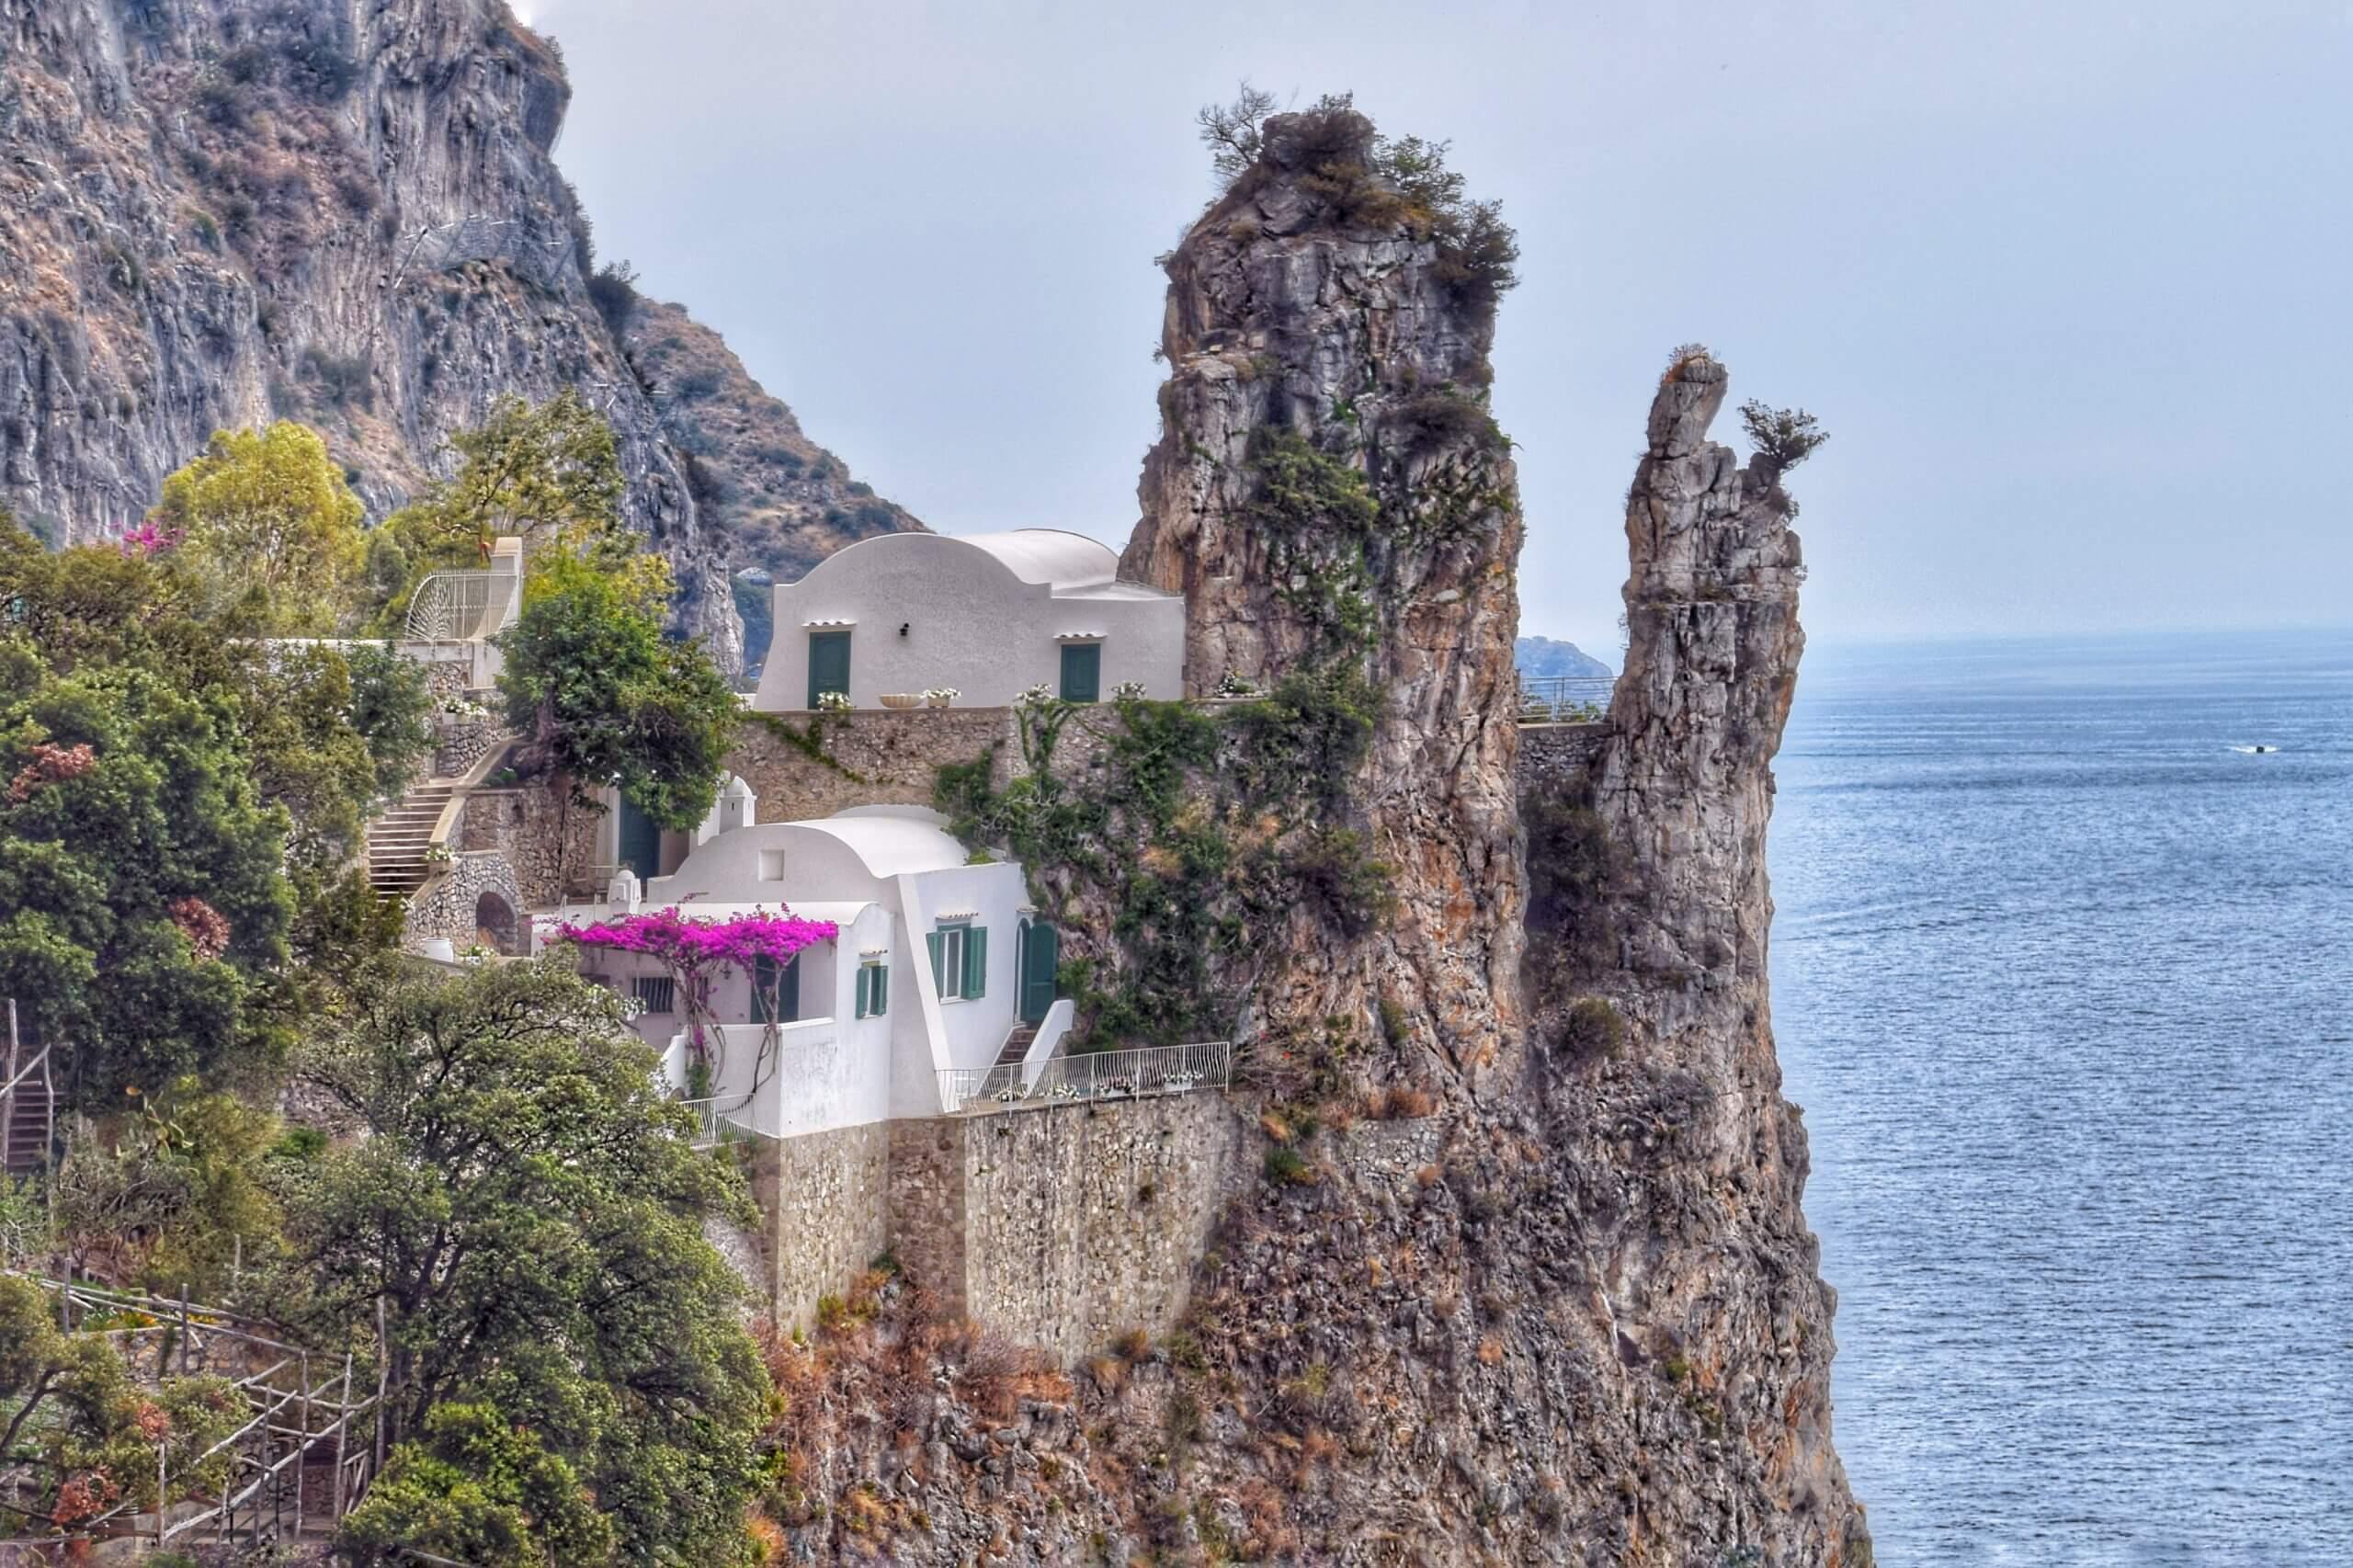 White coastal home in Amalfi, Italy.